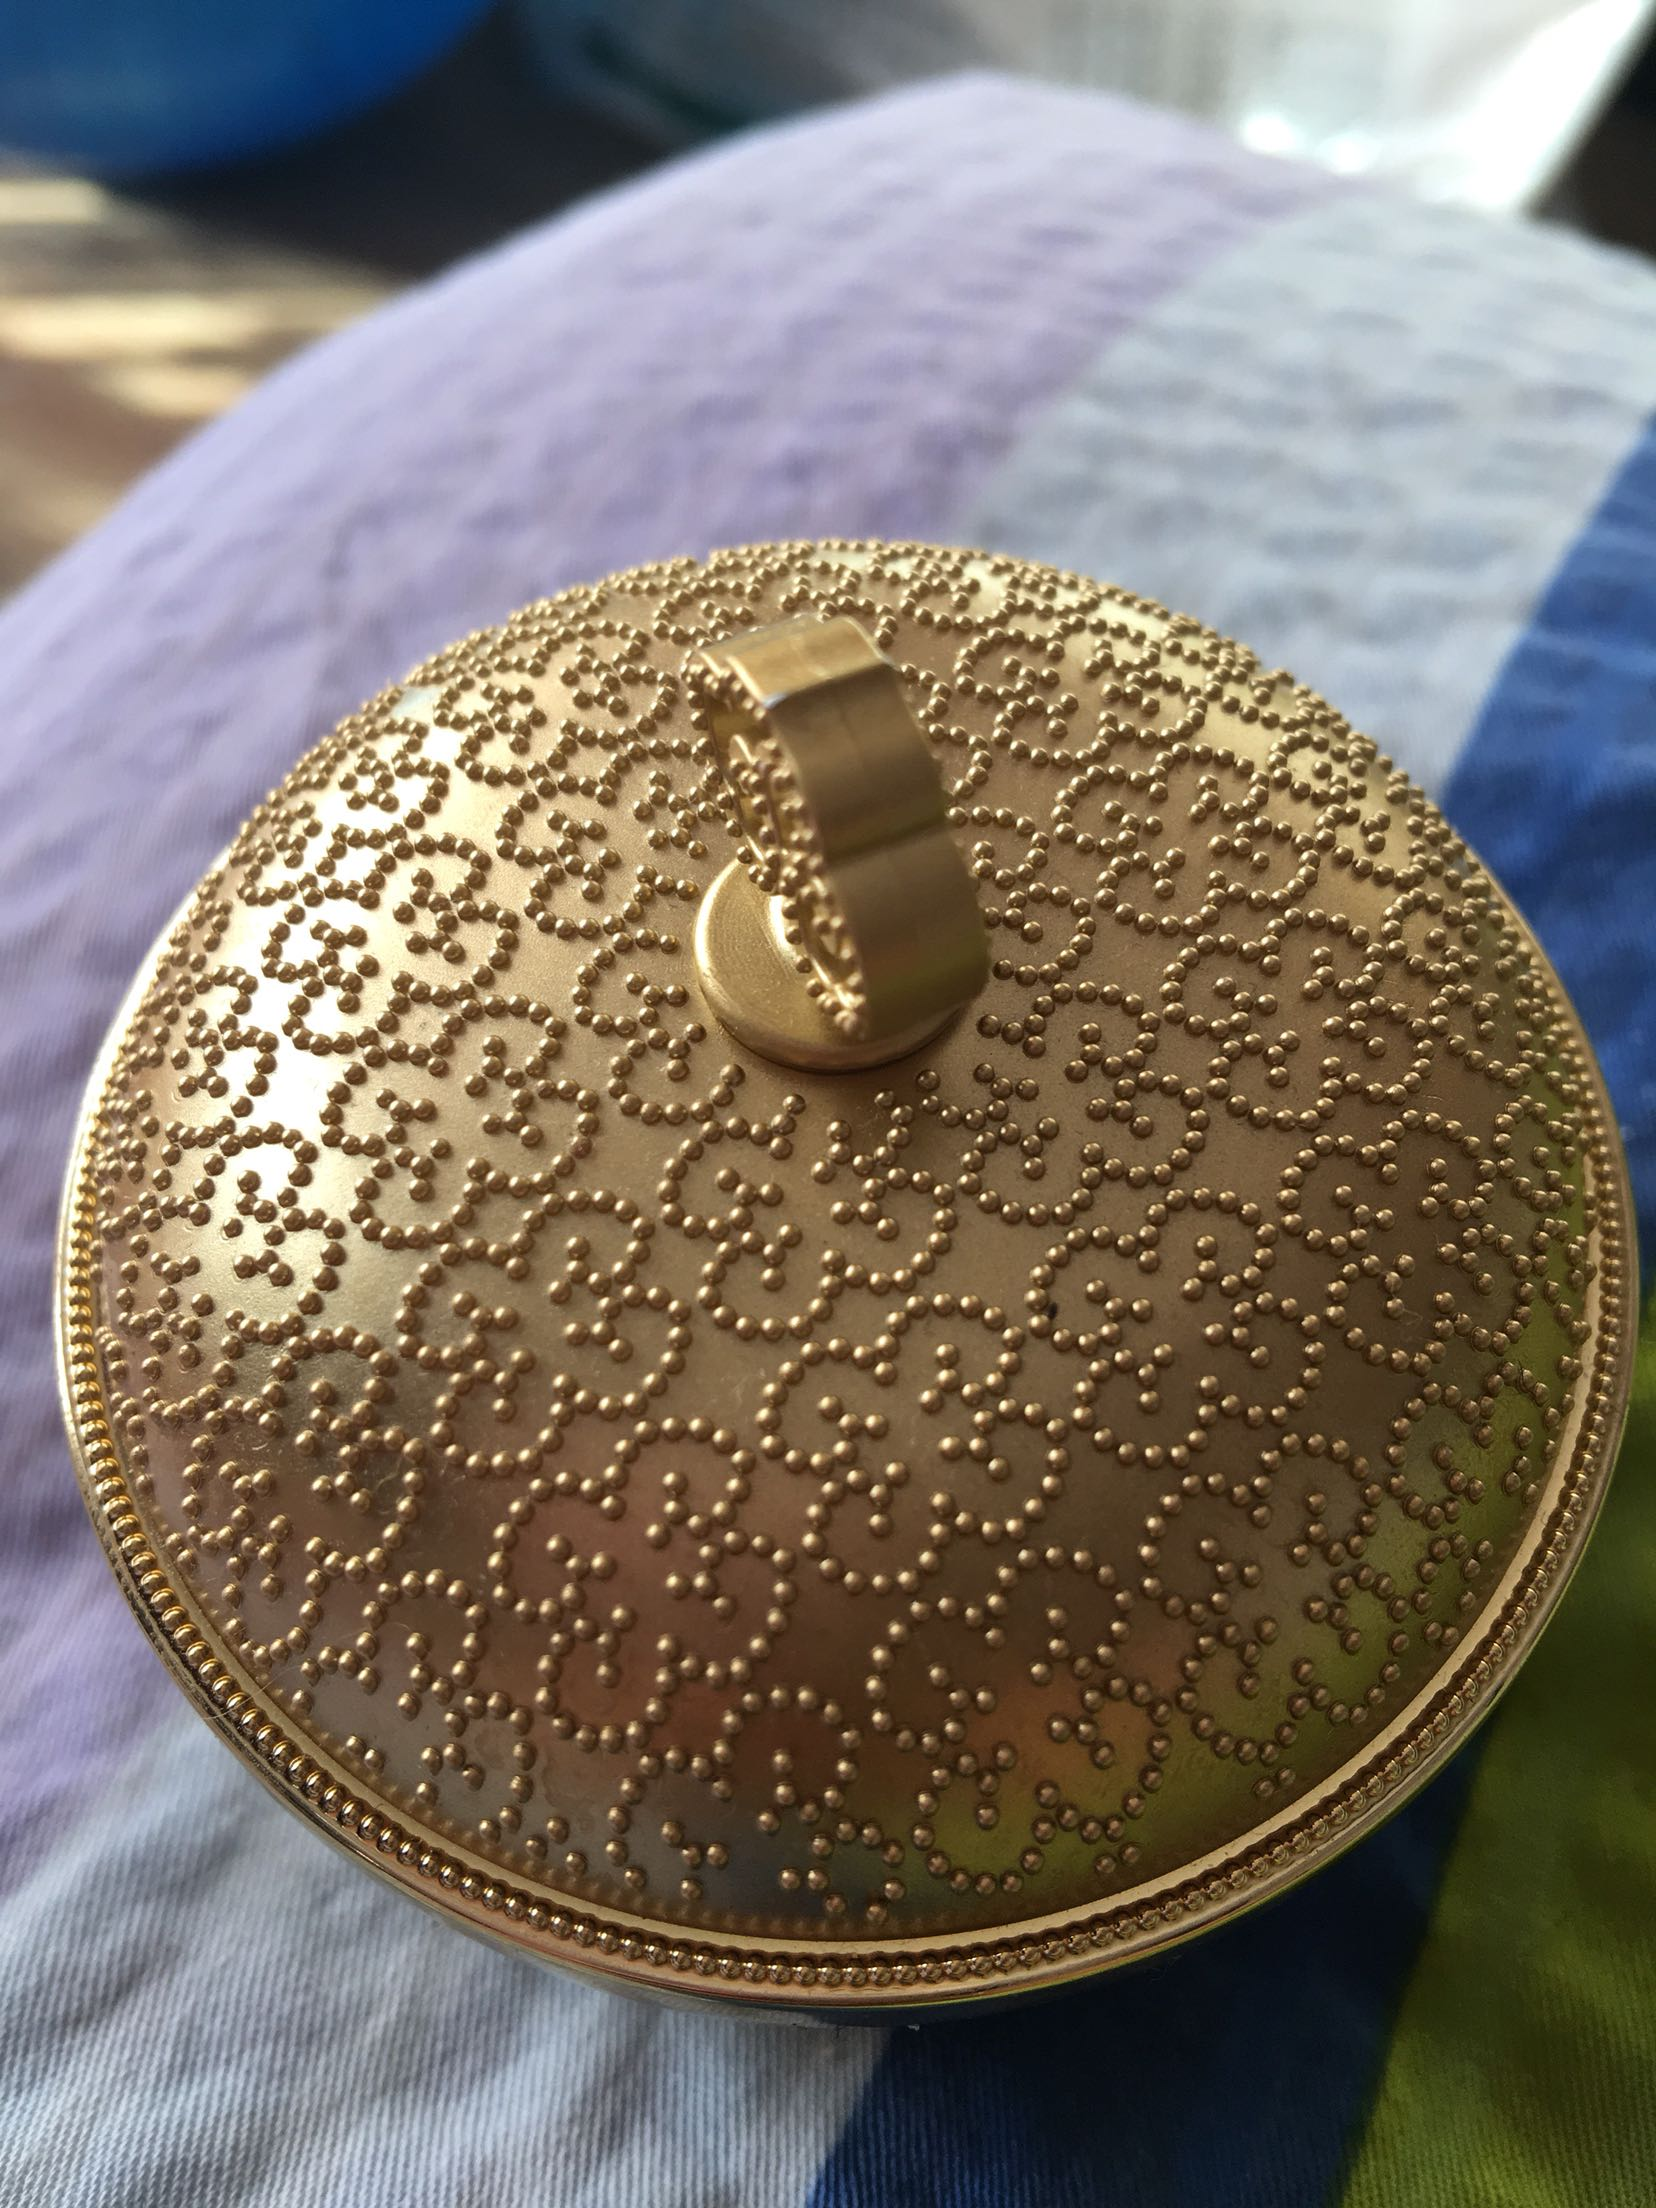 purses boutique 002 balenciaga nike shoes 86587 buy